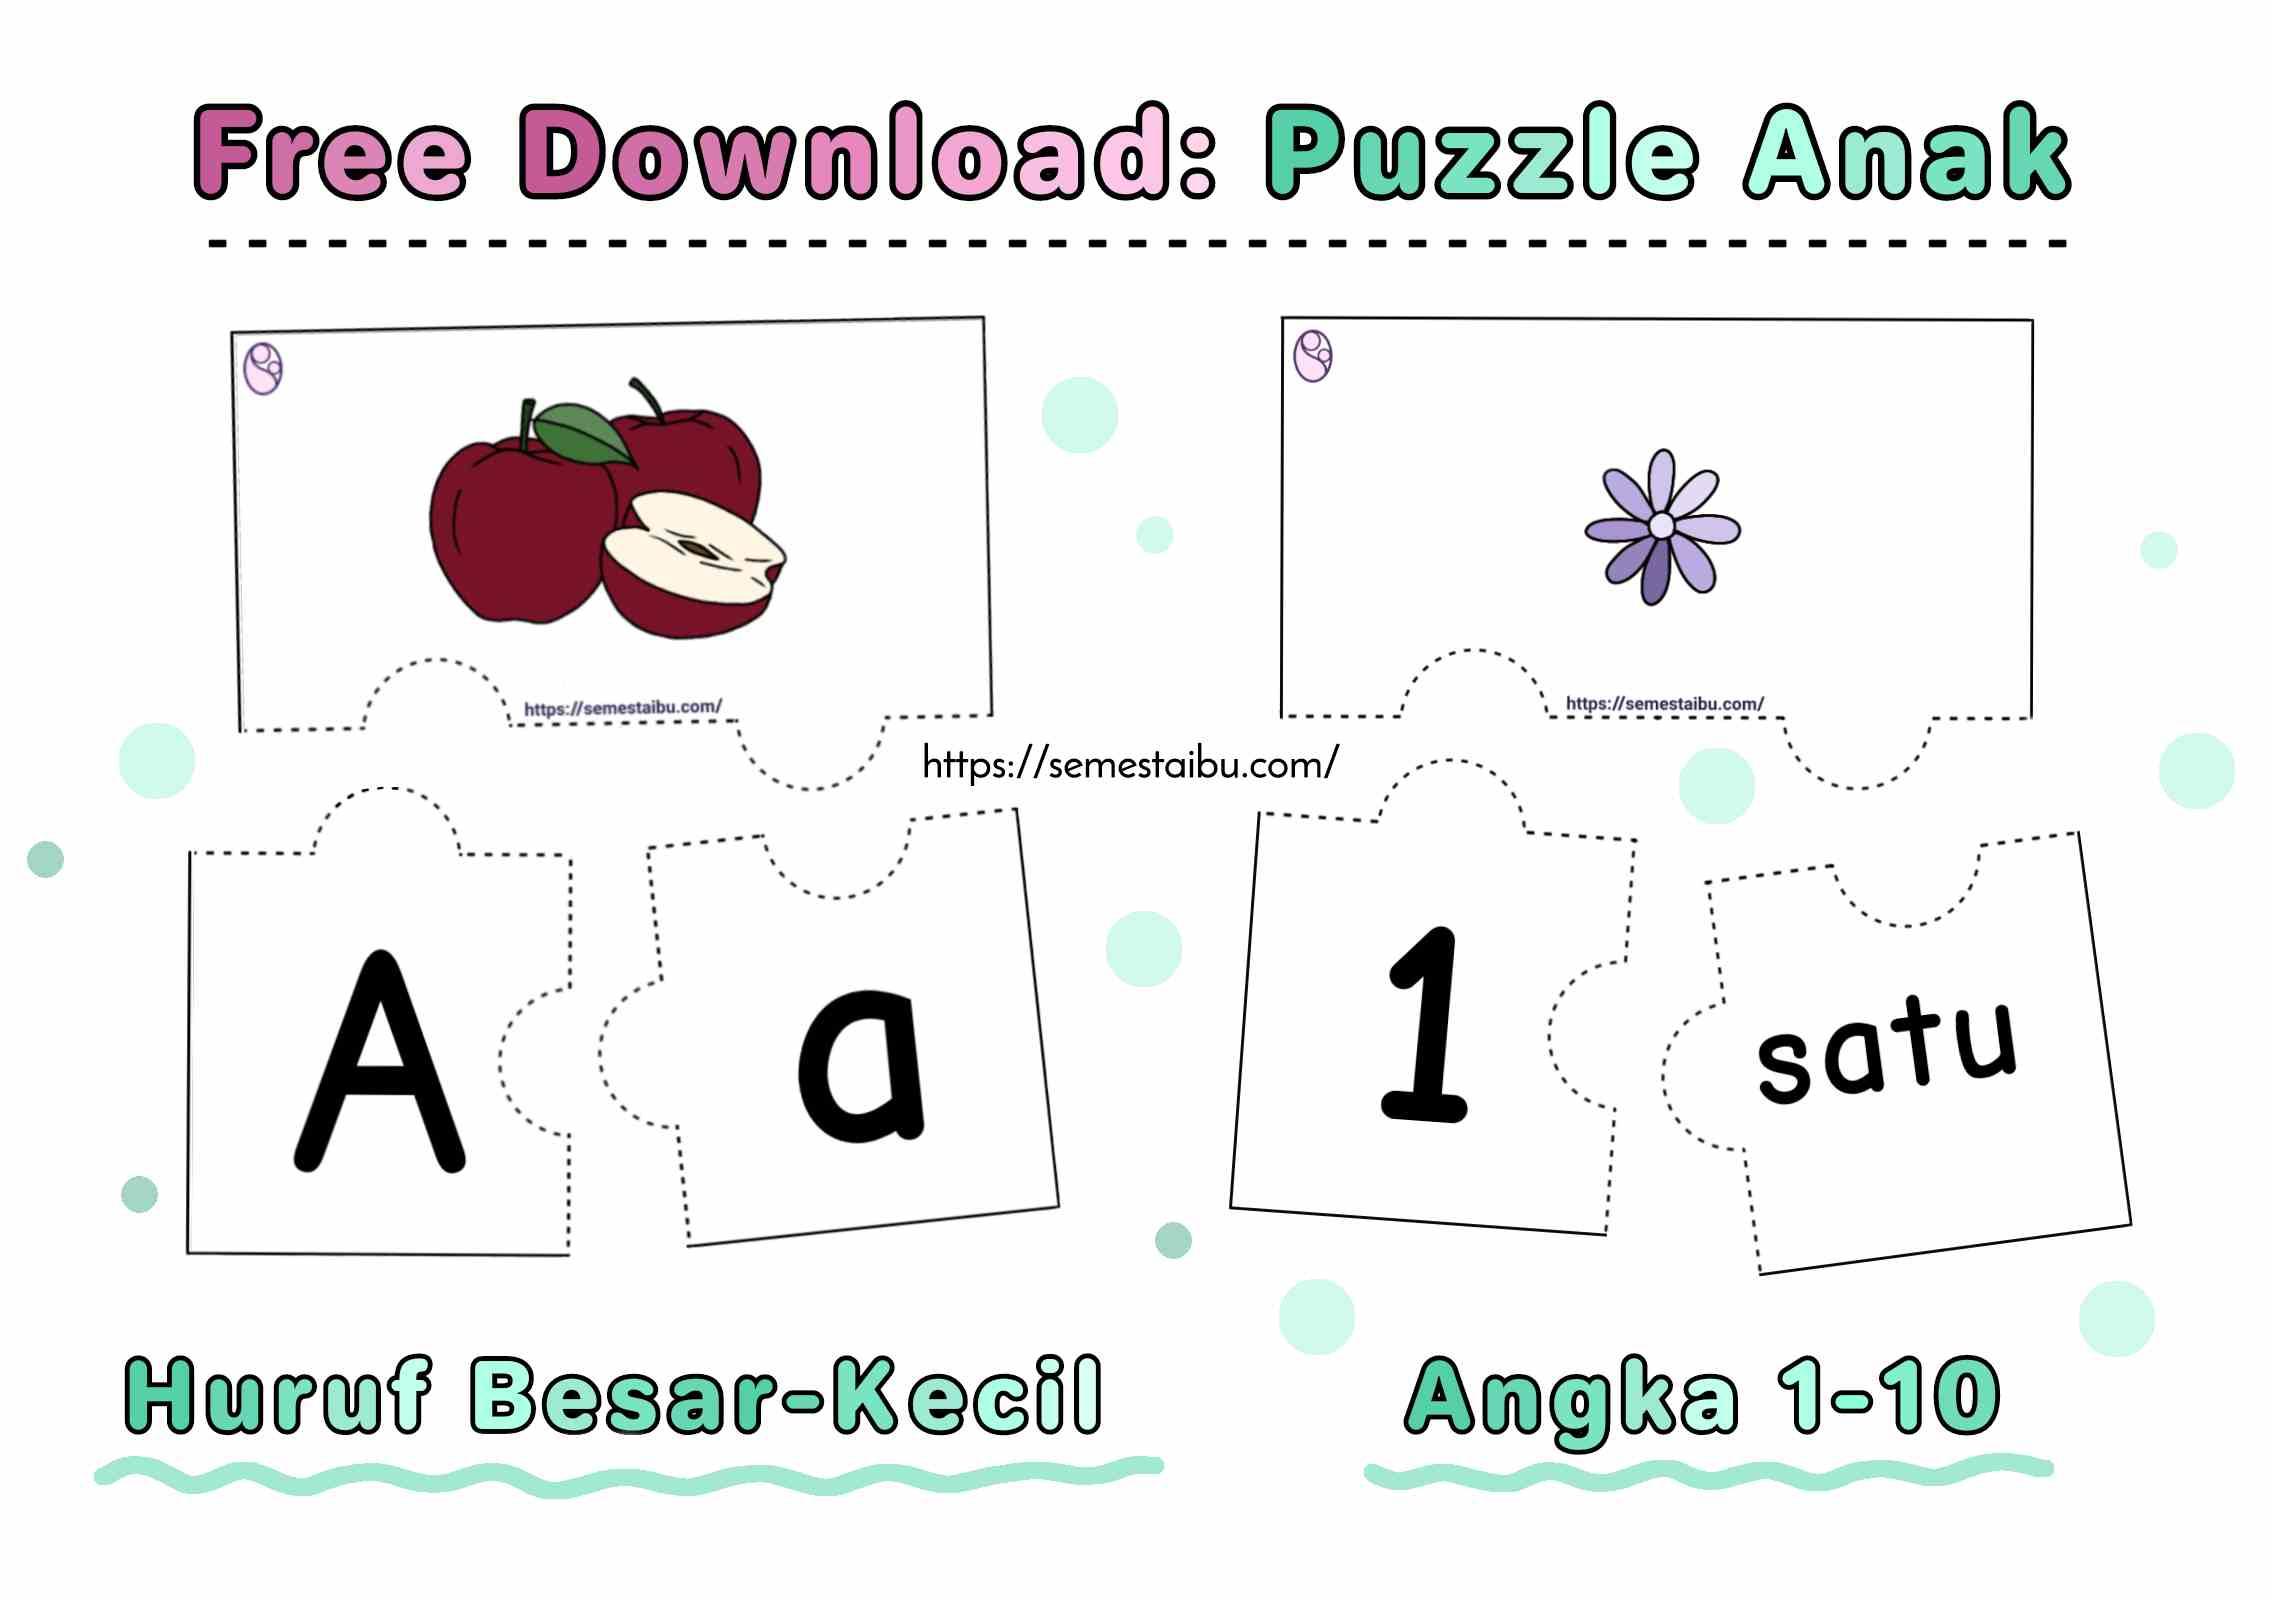 worsheet anak tk - puzzle huruf besar huruf kecil